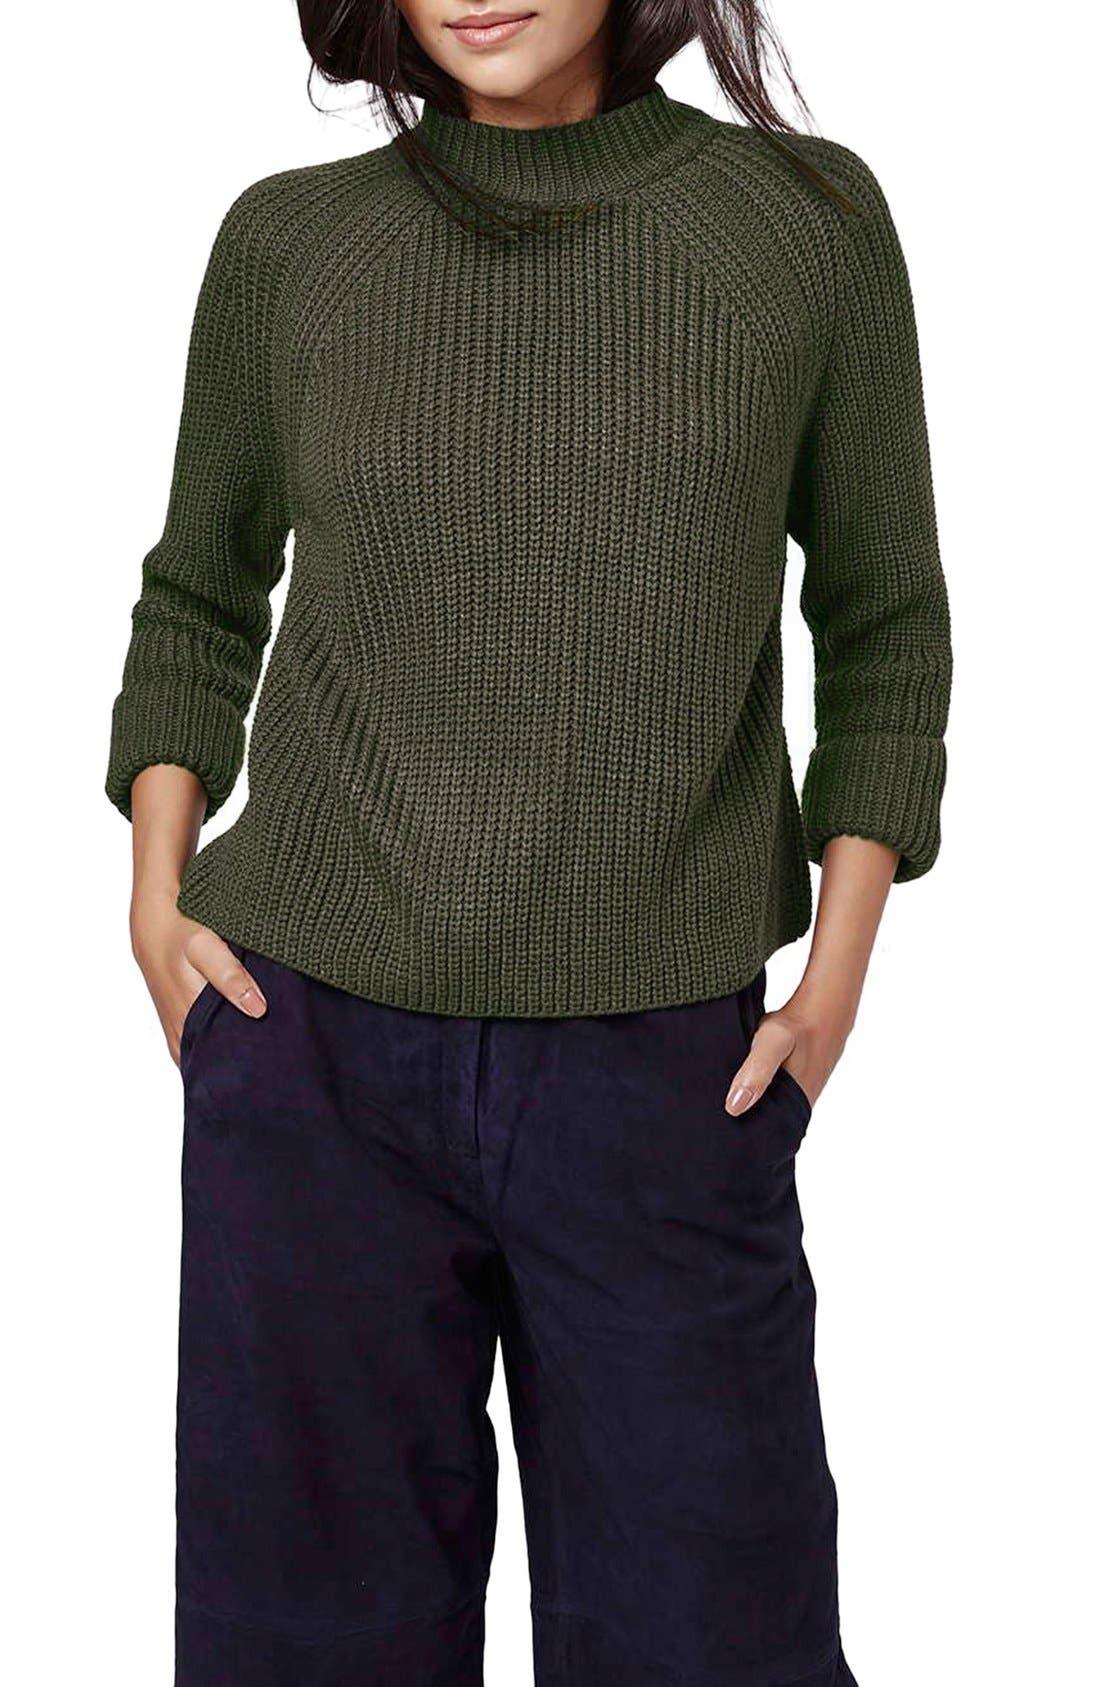 Alternate Image 1 Selected - Topshop Mock Neck Raglan Sweater